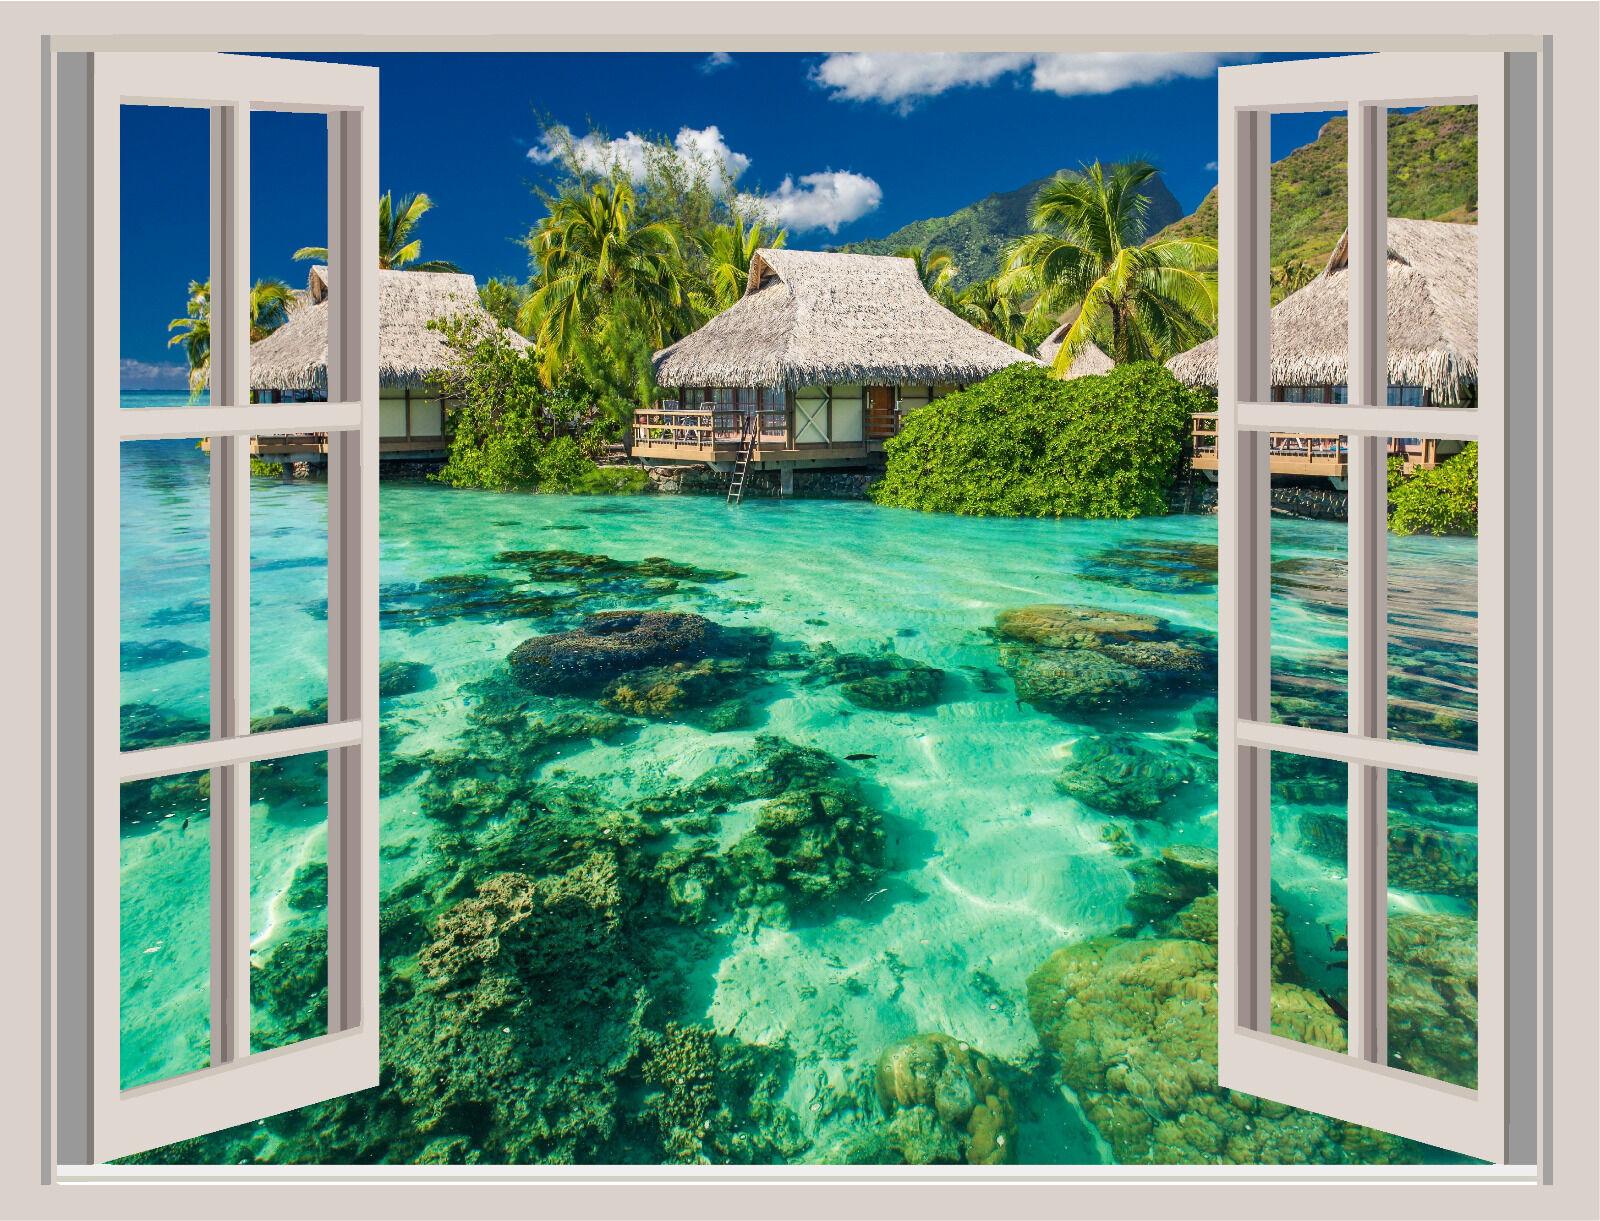 Tropical Island Beach Window View Repositionable Wall Sticker Wall Mural 48x36